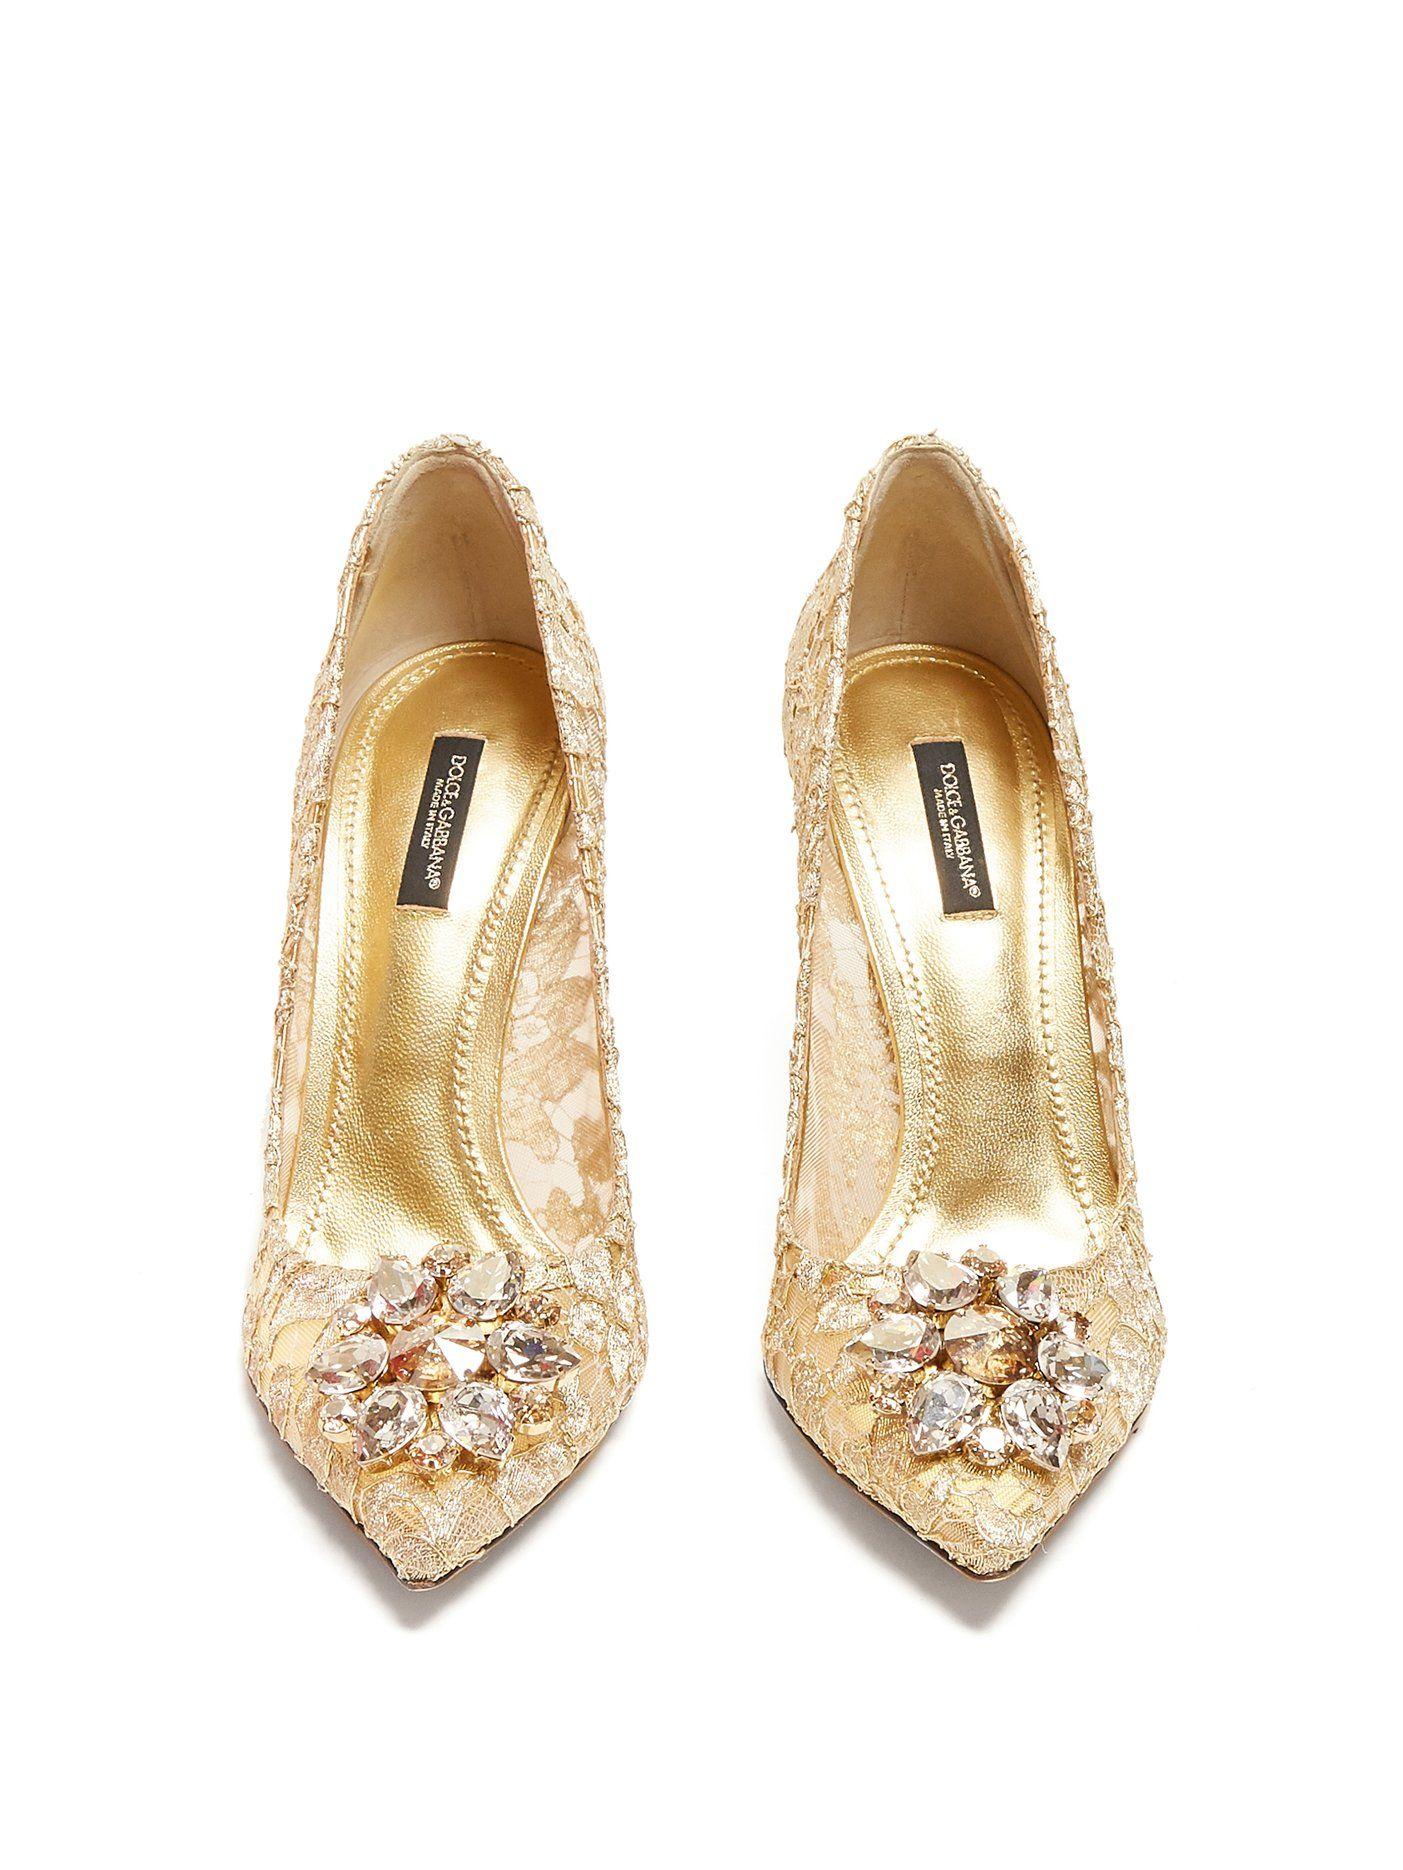 343254c6deb1 Bellucci crystal-embellished lace pumps